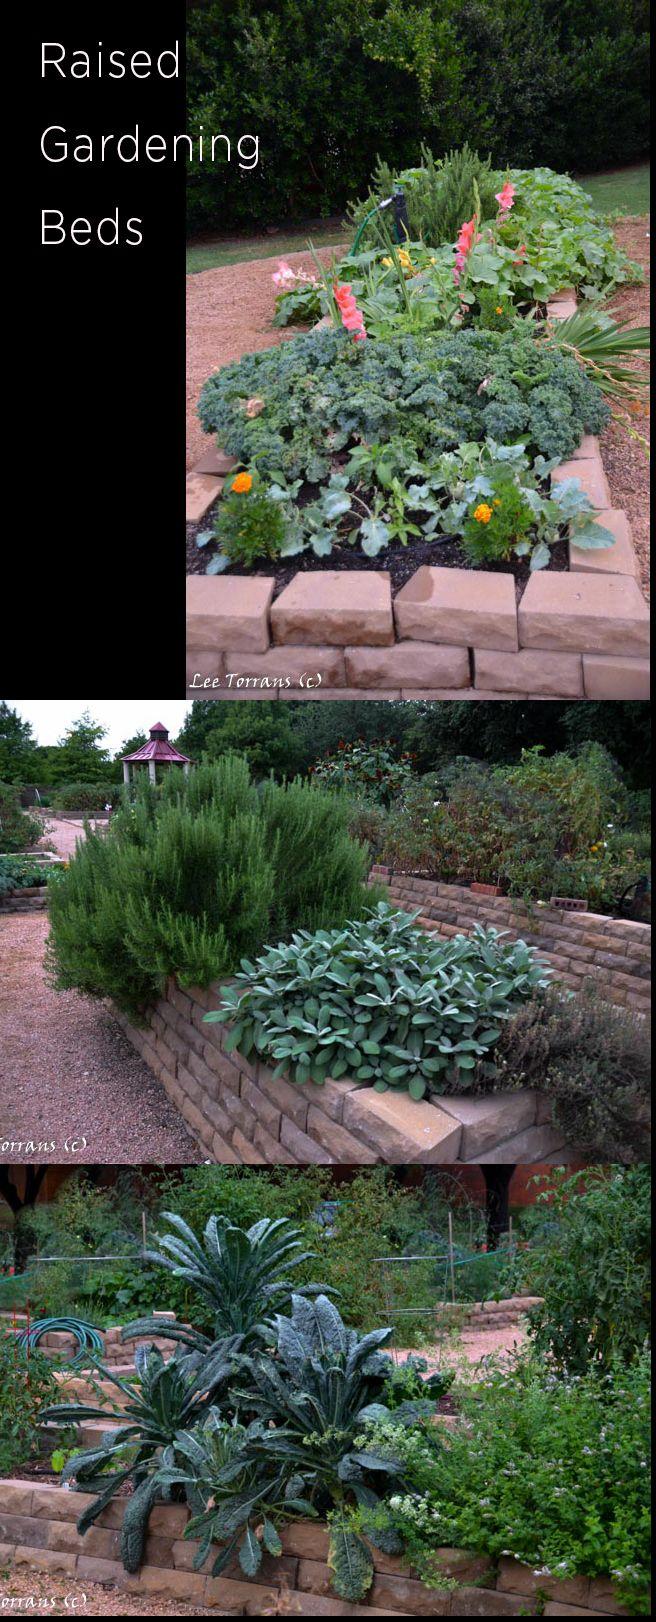 Lee Ann Torrans Gardening | The Latest Gardening Gadgets Getting Young Trees Through Hot Times | http://leeanntorrans.com